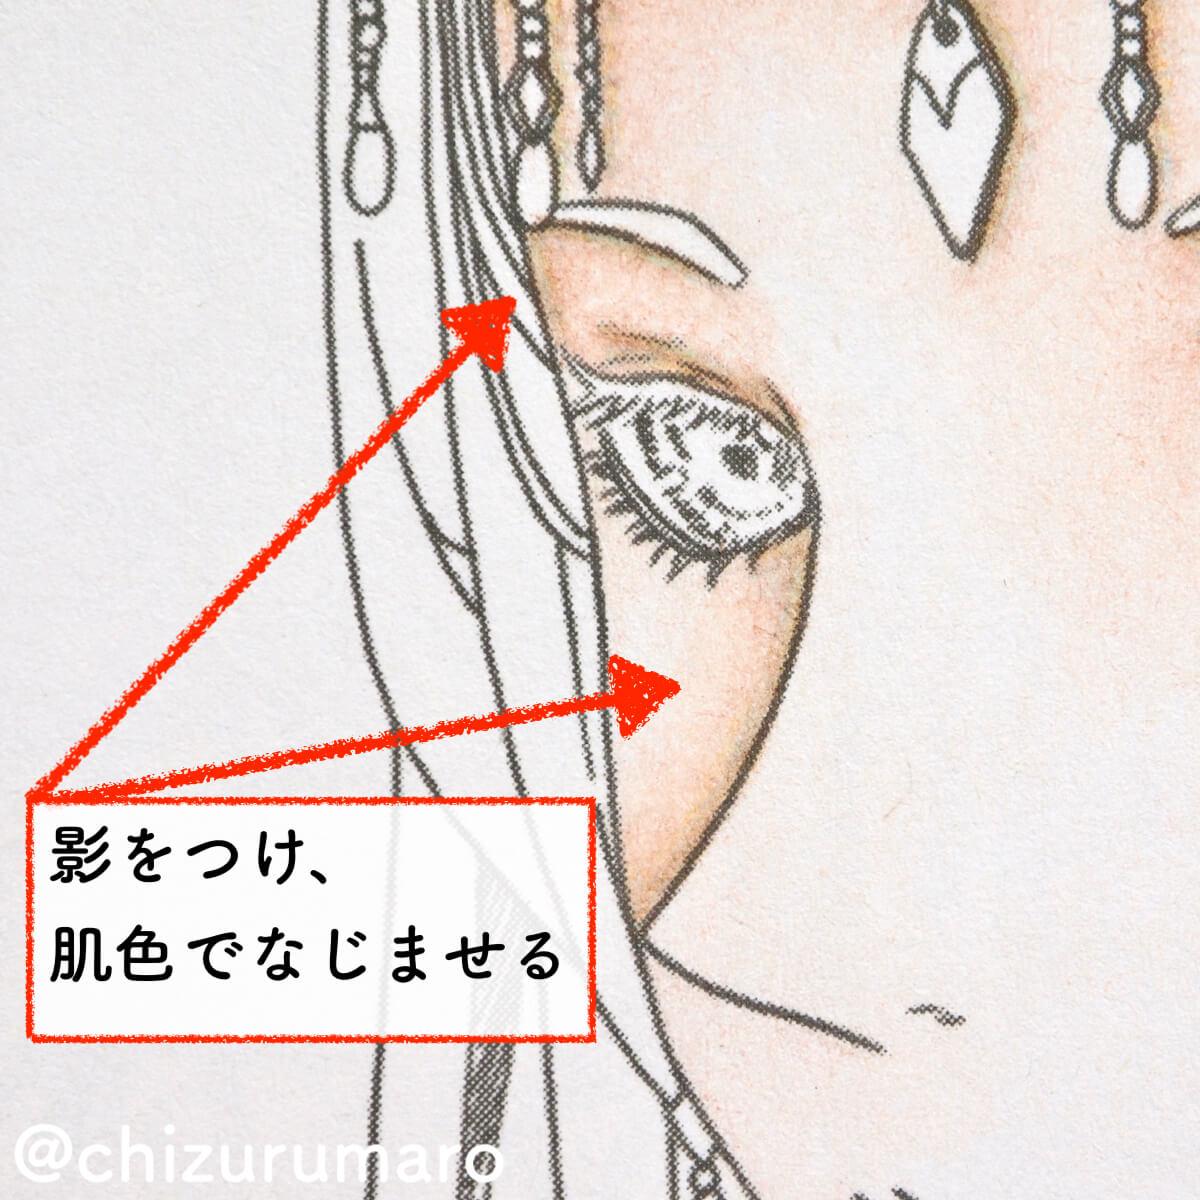 f:id:chizurumaro:20200426134033j:plain